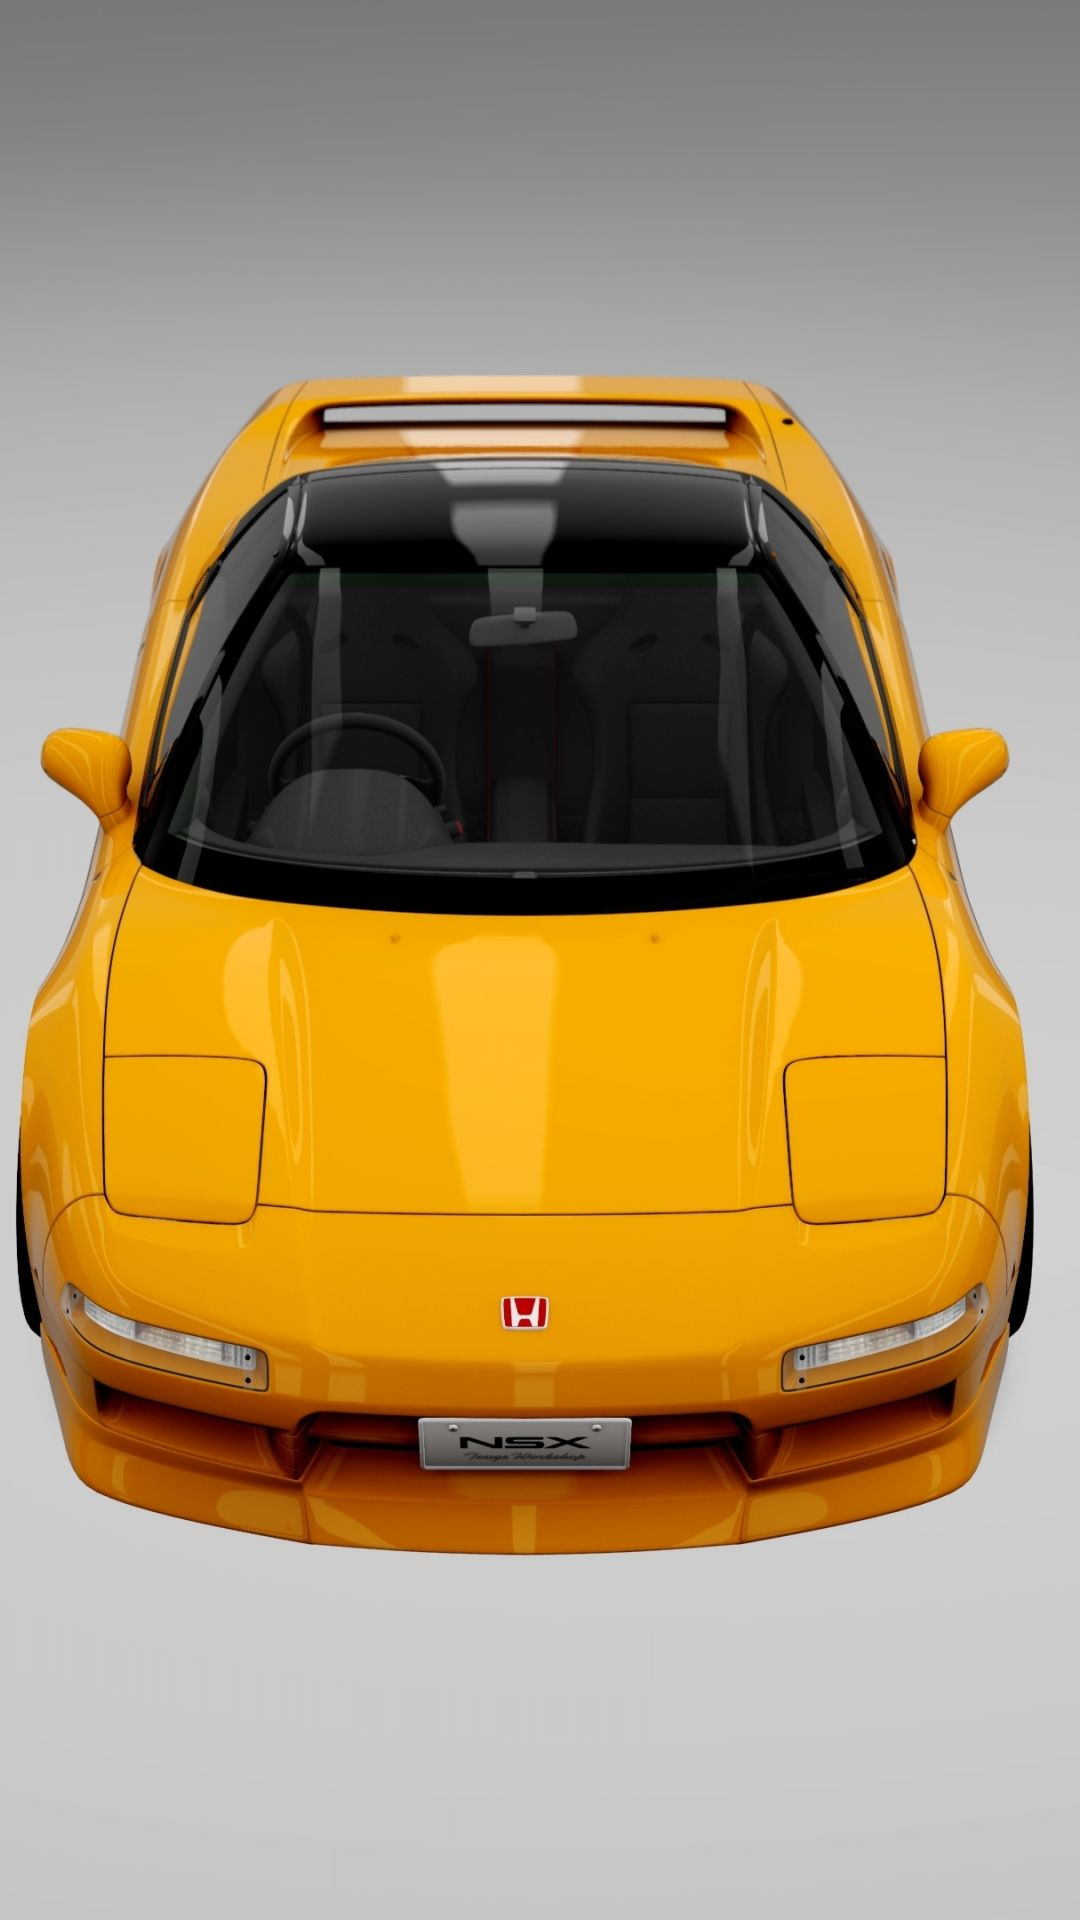 1080x1920 Honda Nsx Orange Car Wallpaper Orange Car Nsx Orange Car Wallpaper